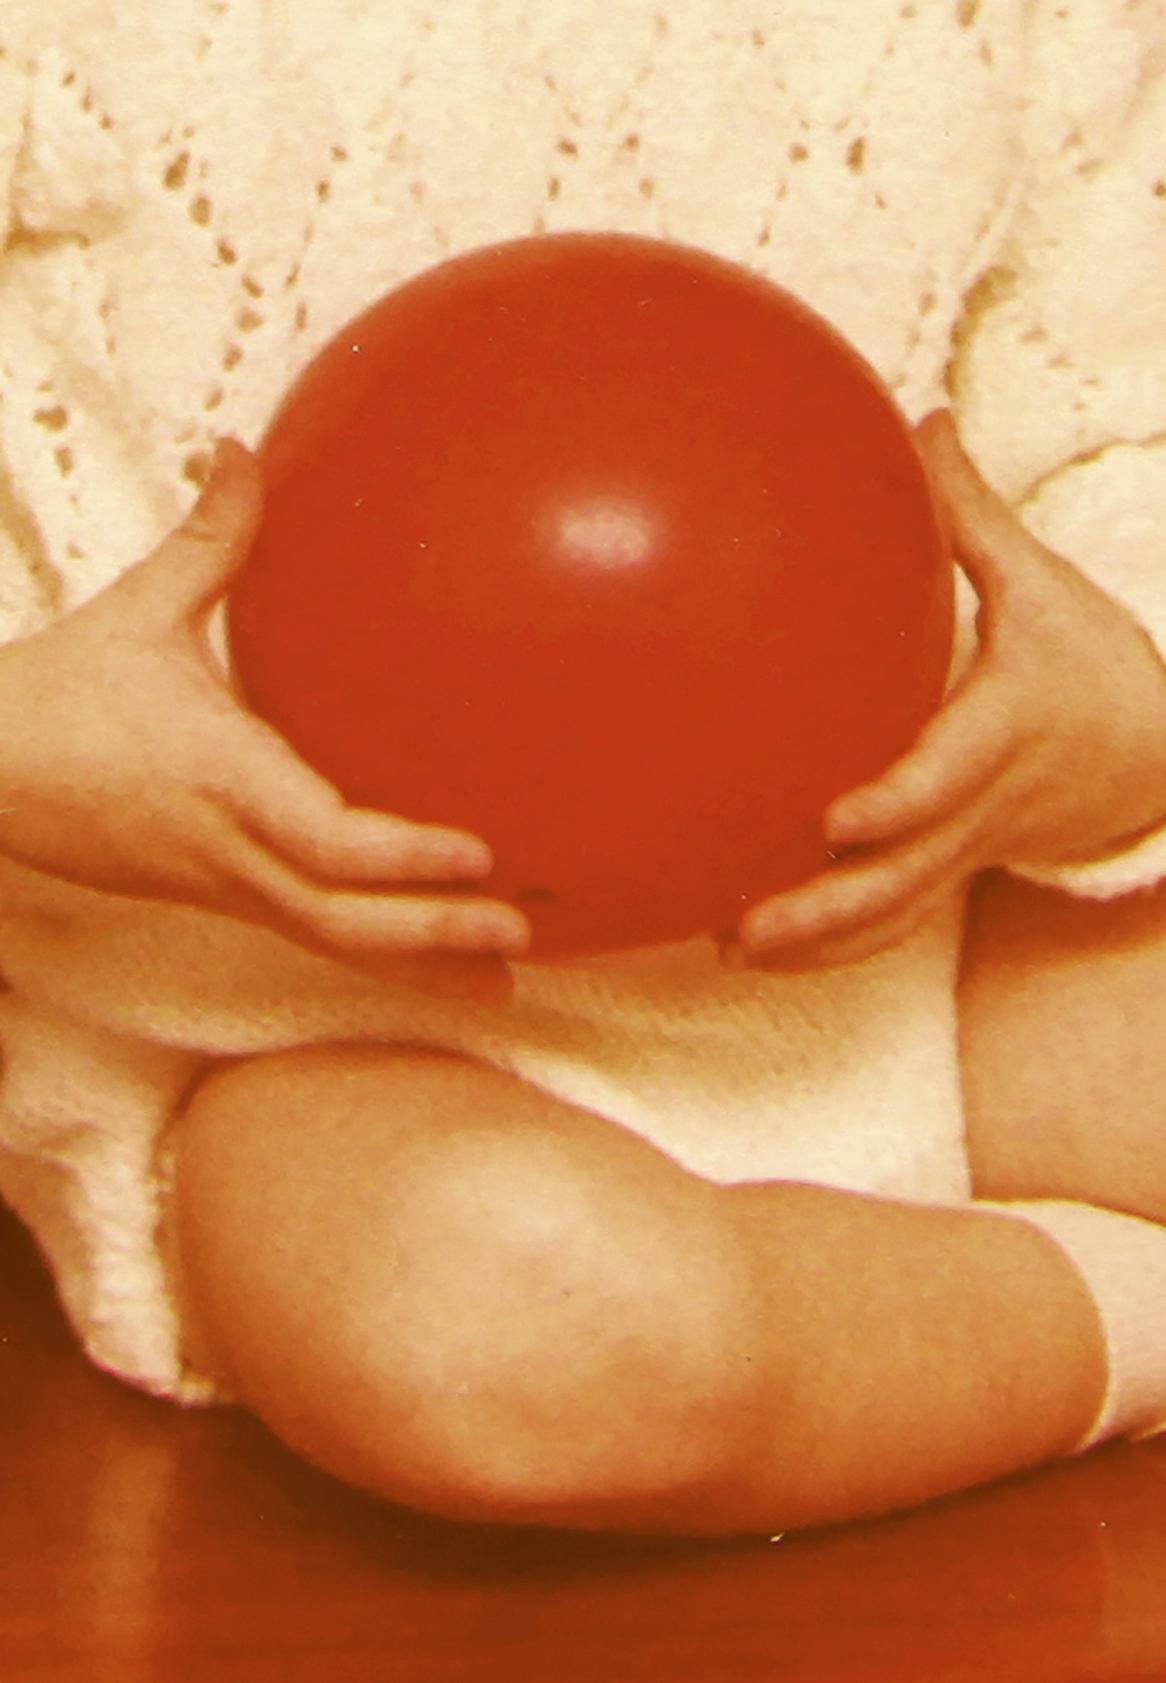 Red ball_small.jpg